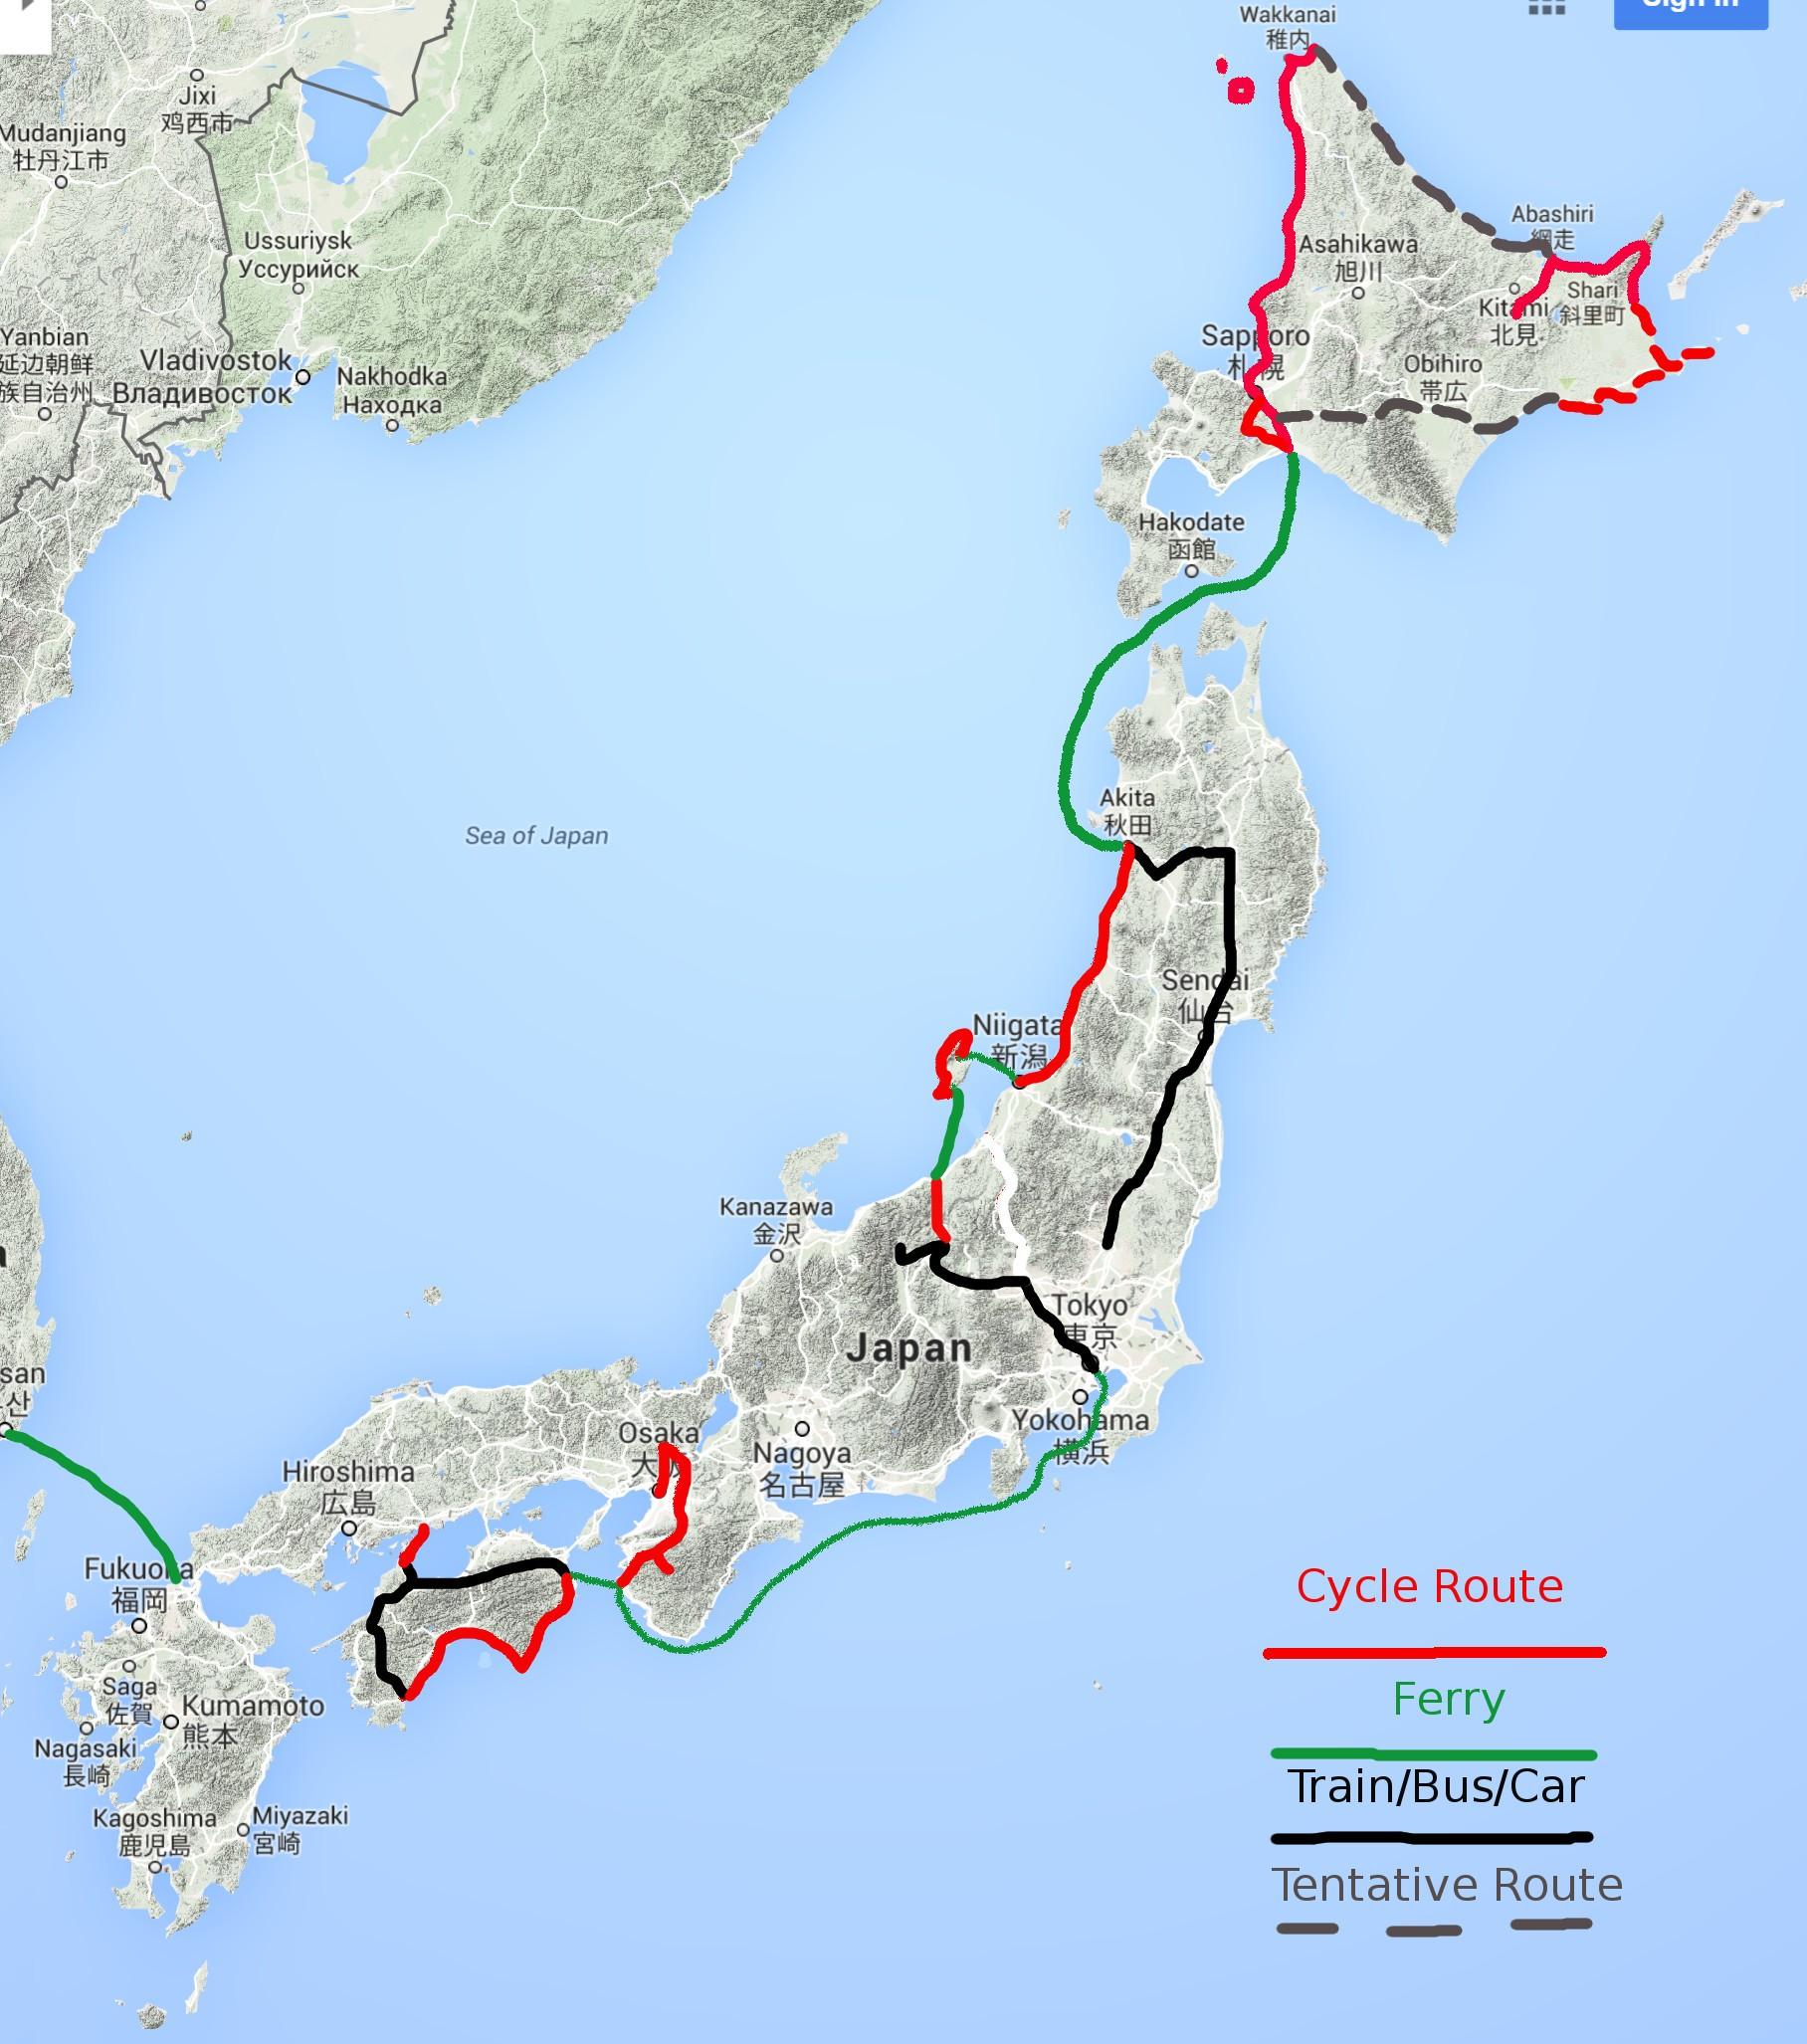 Japan Route 2016